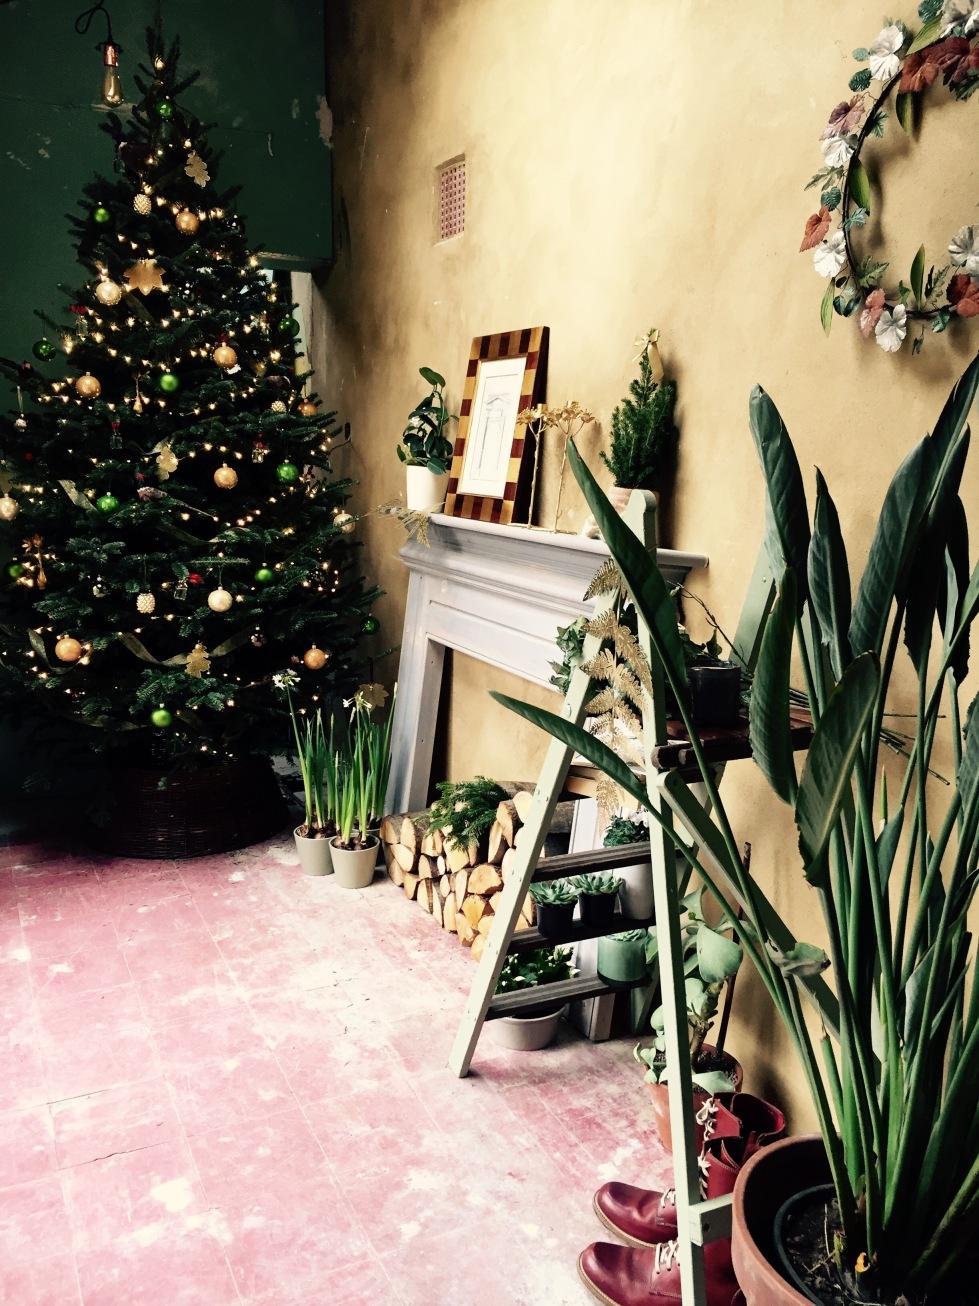 Garden room, The Watch House, December 2016